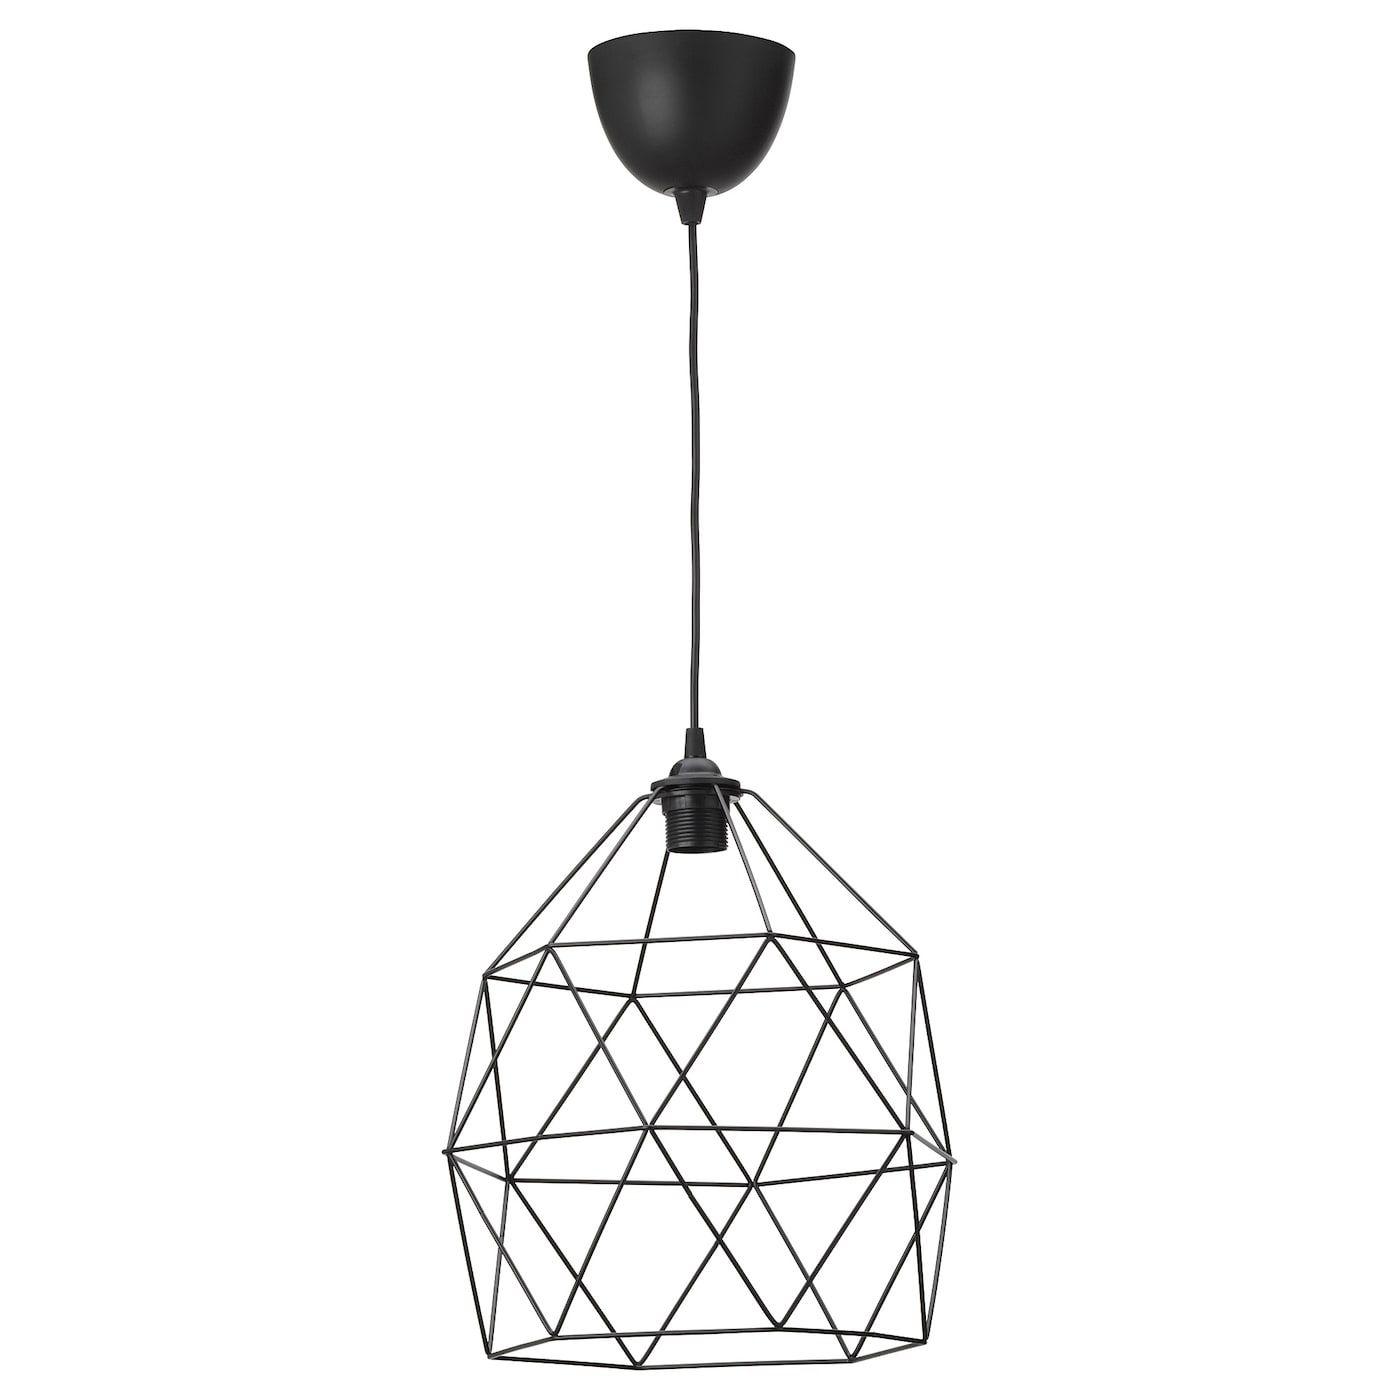 Brunsta Hemma Pendant Lamp Black 12 In 2020 Pendant Lamp Ikea Lamp Ceiling Lights